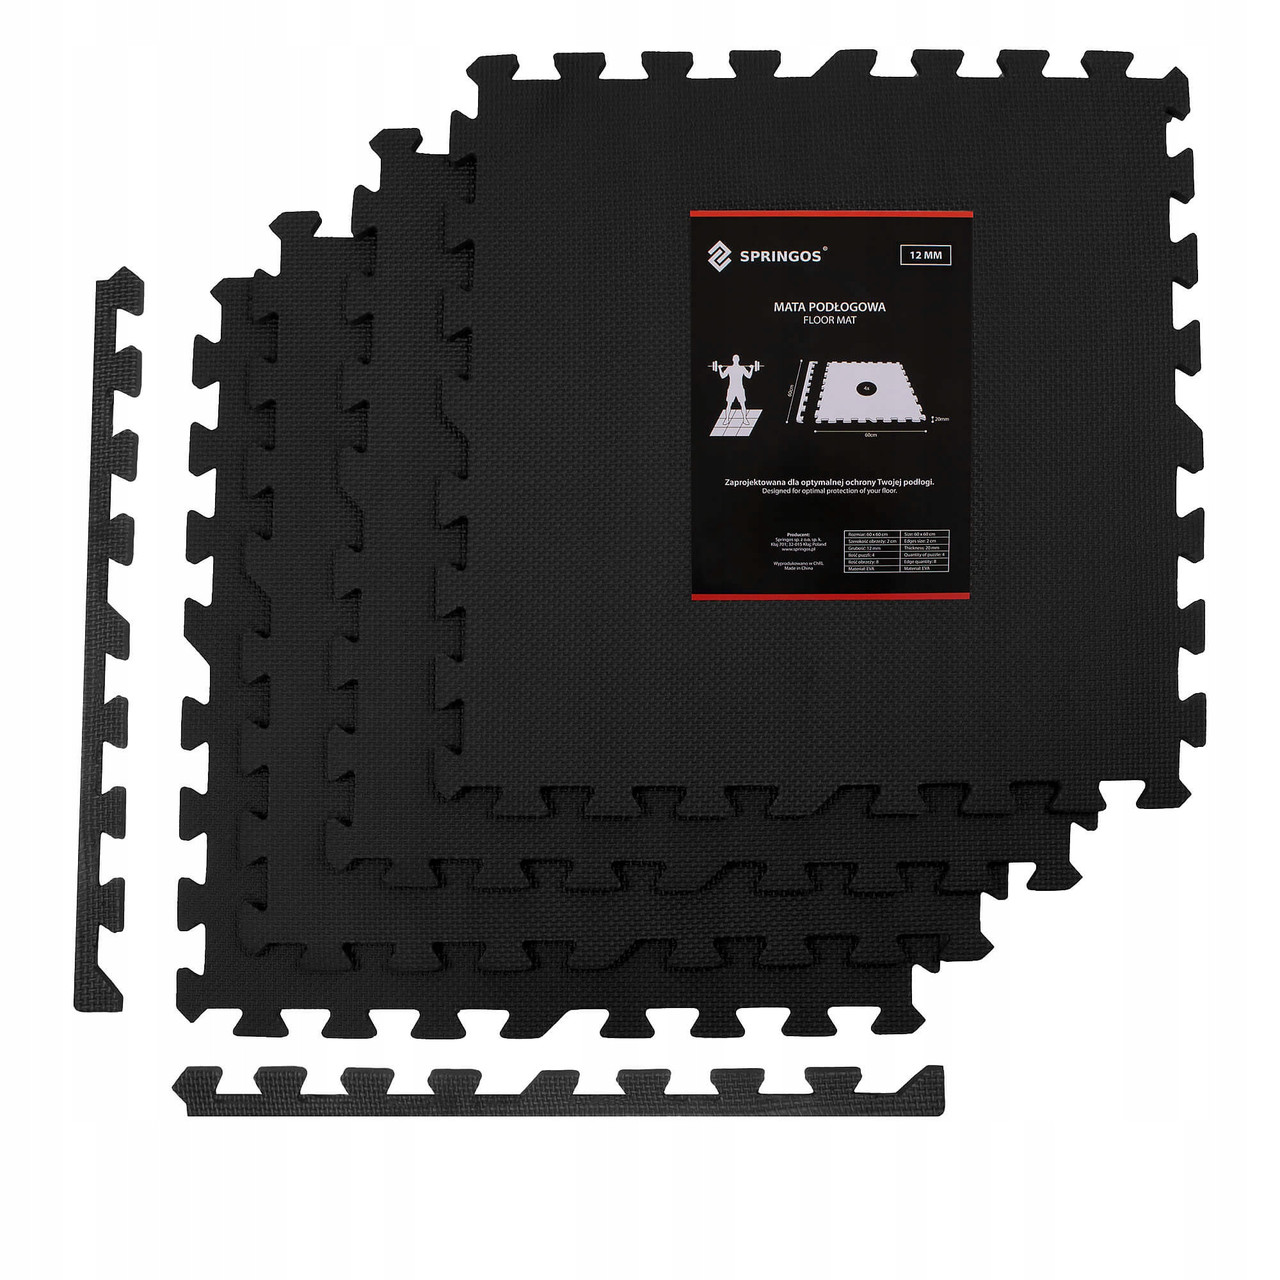 Мат-пазл (ласточкин хвост) Springos Mat Puzzle EVA 120 x 120 x 1.2 cм FM0002 Black